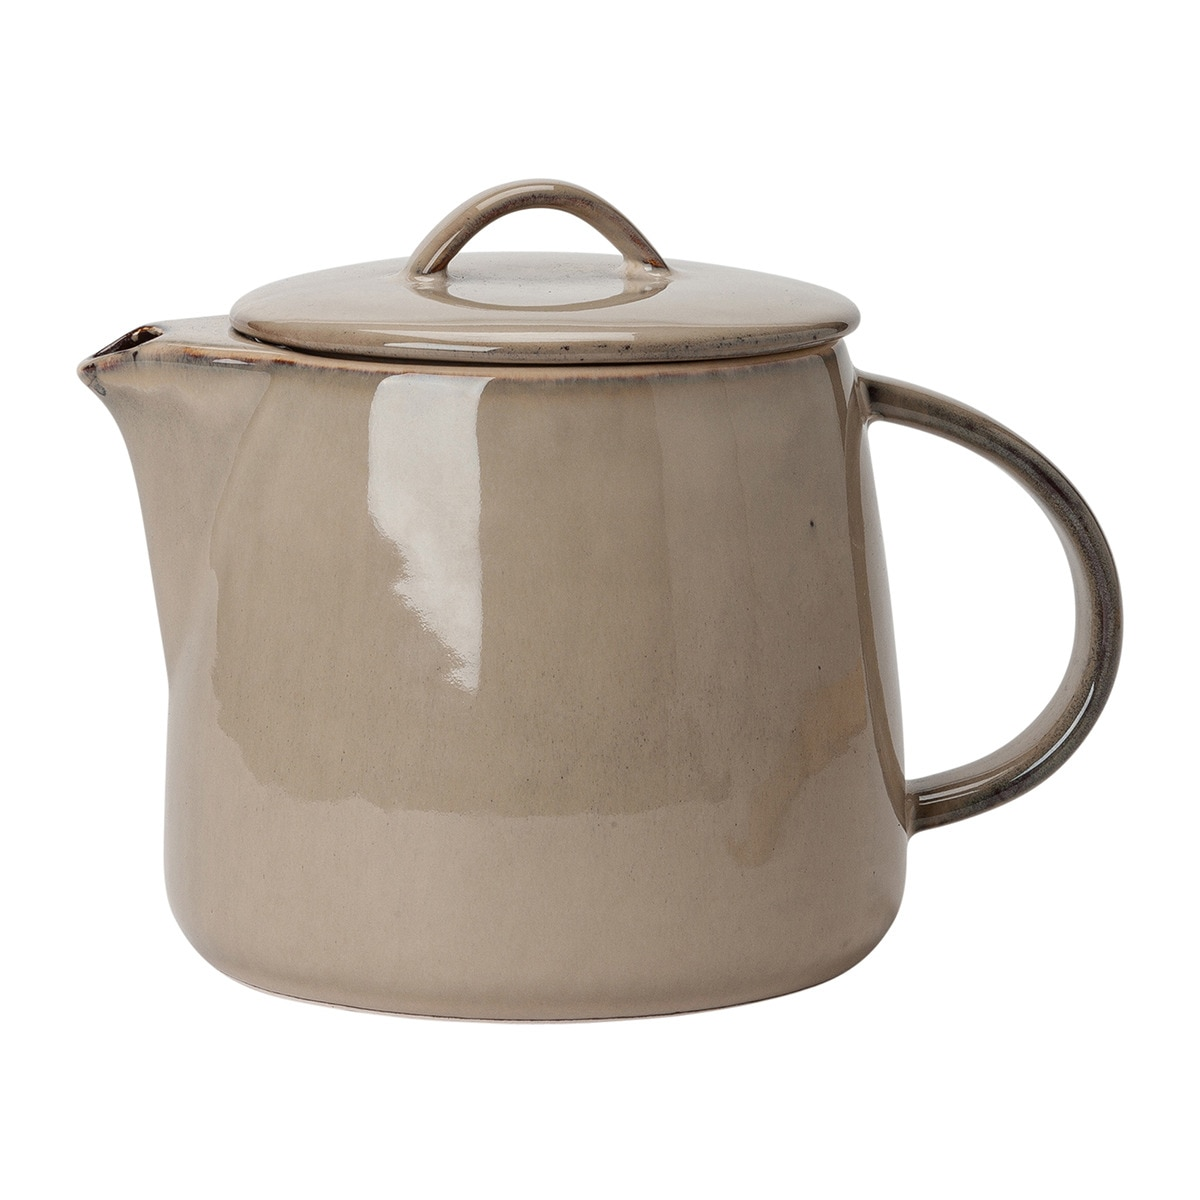 Tetera de cerámica El Corte Inglés